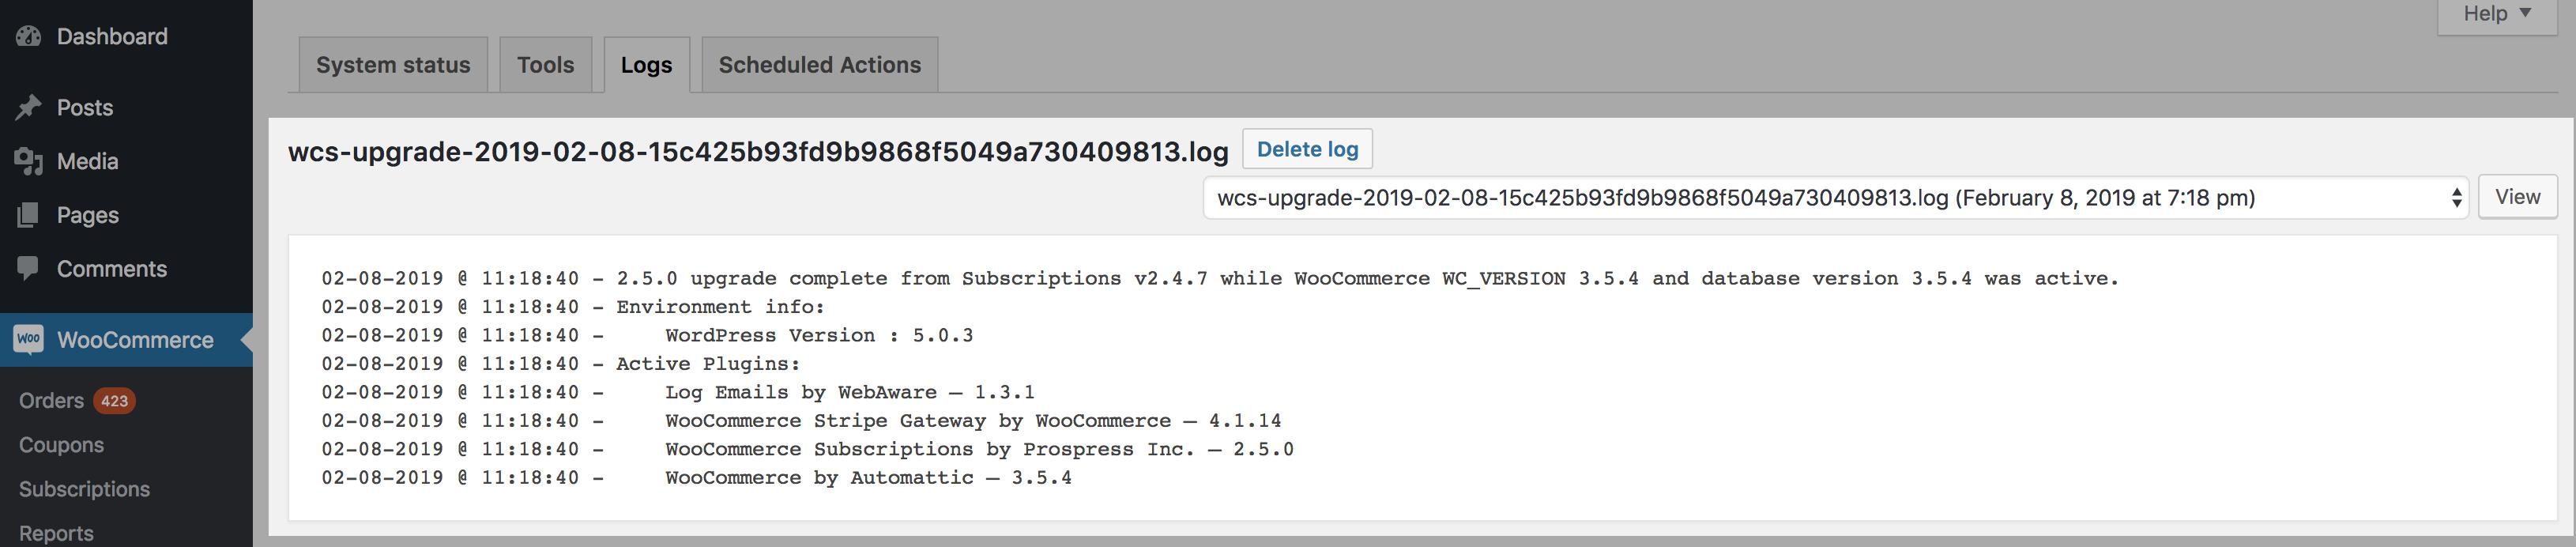 Upgrade Log Example